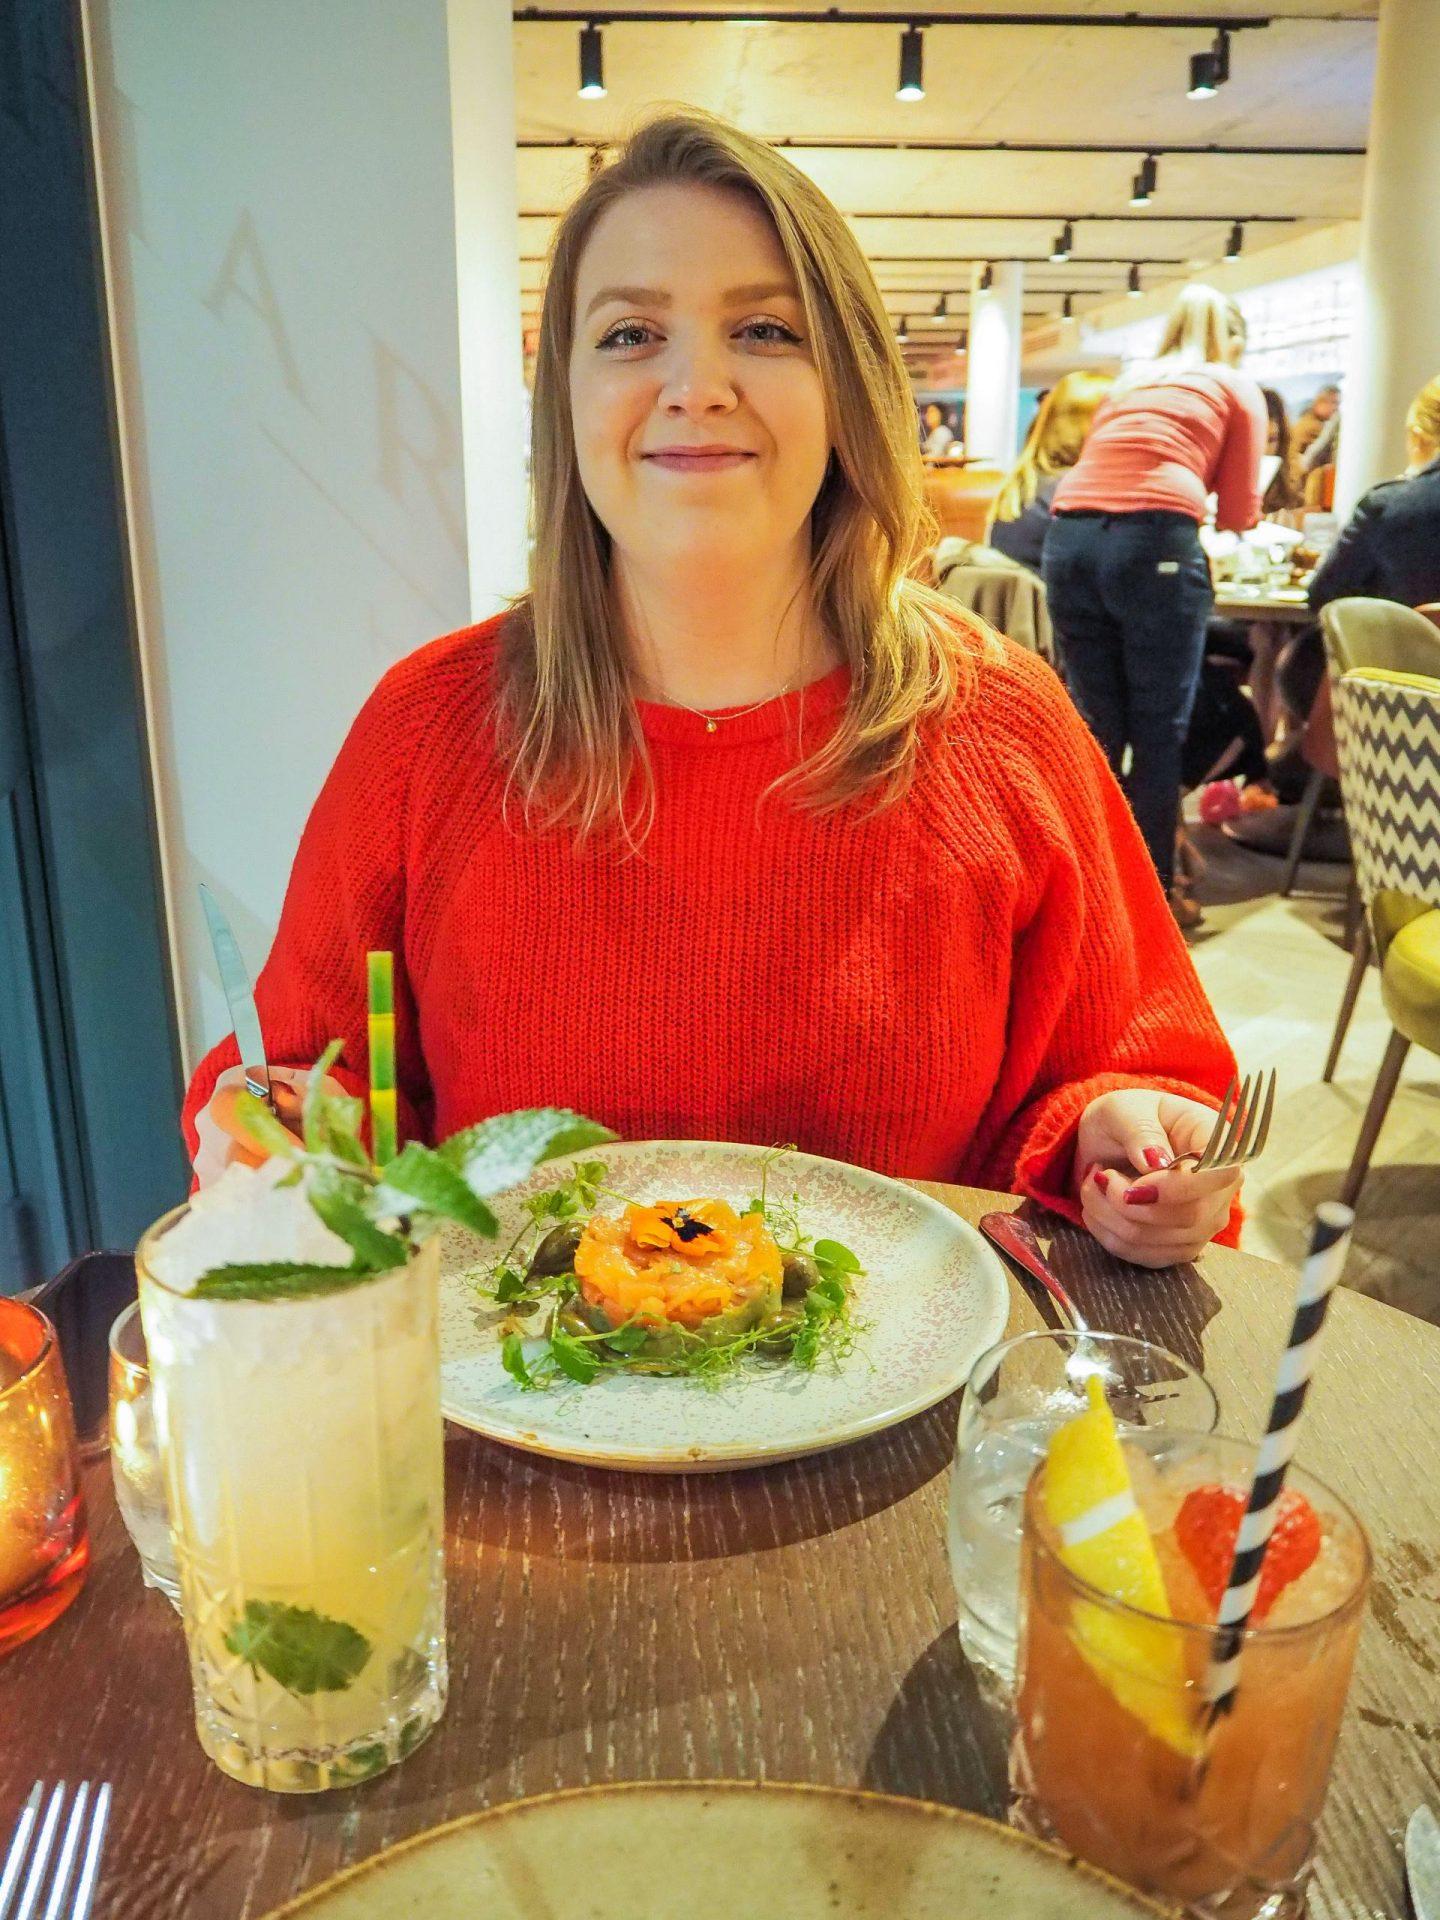 harbar on 6th - date night in Hampshire